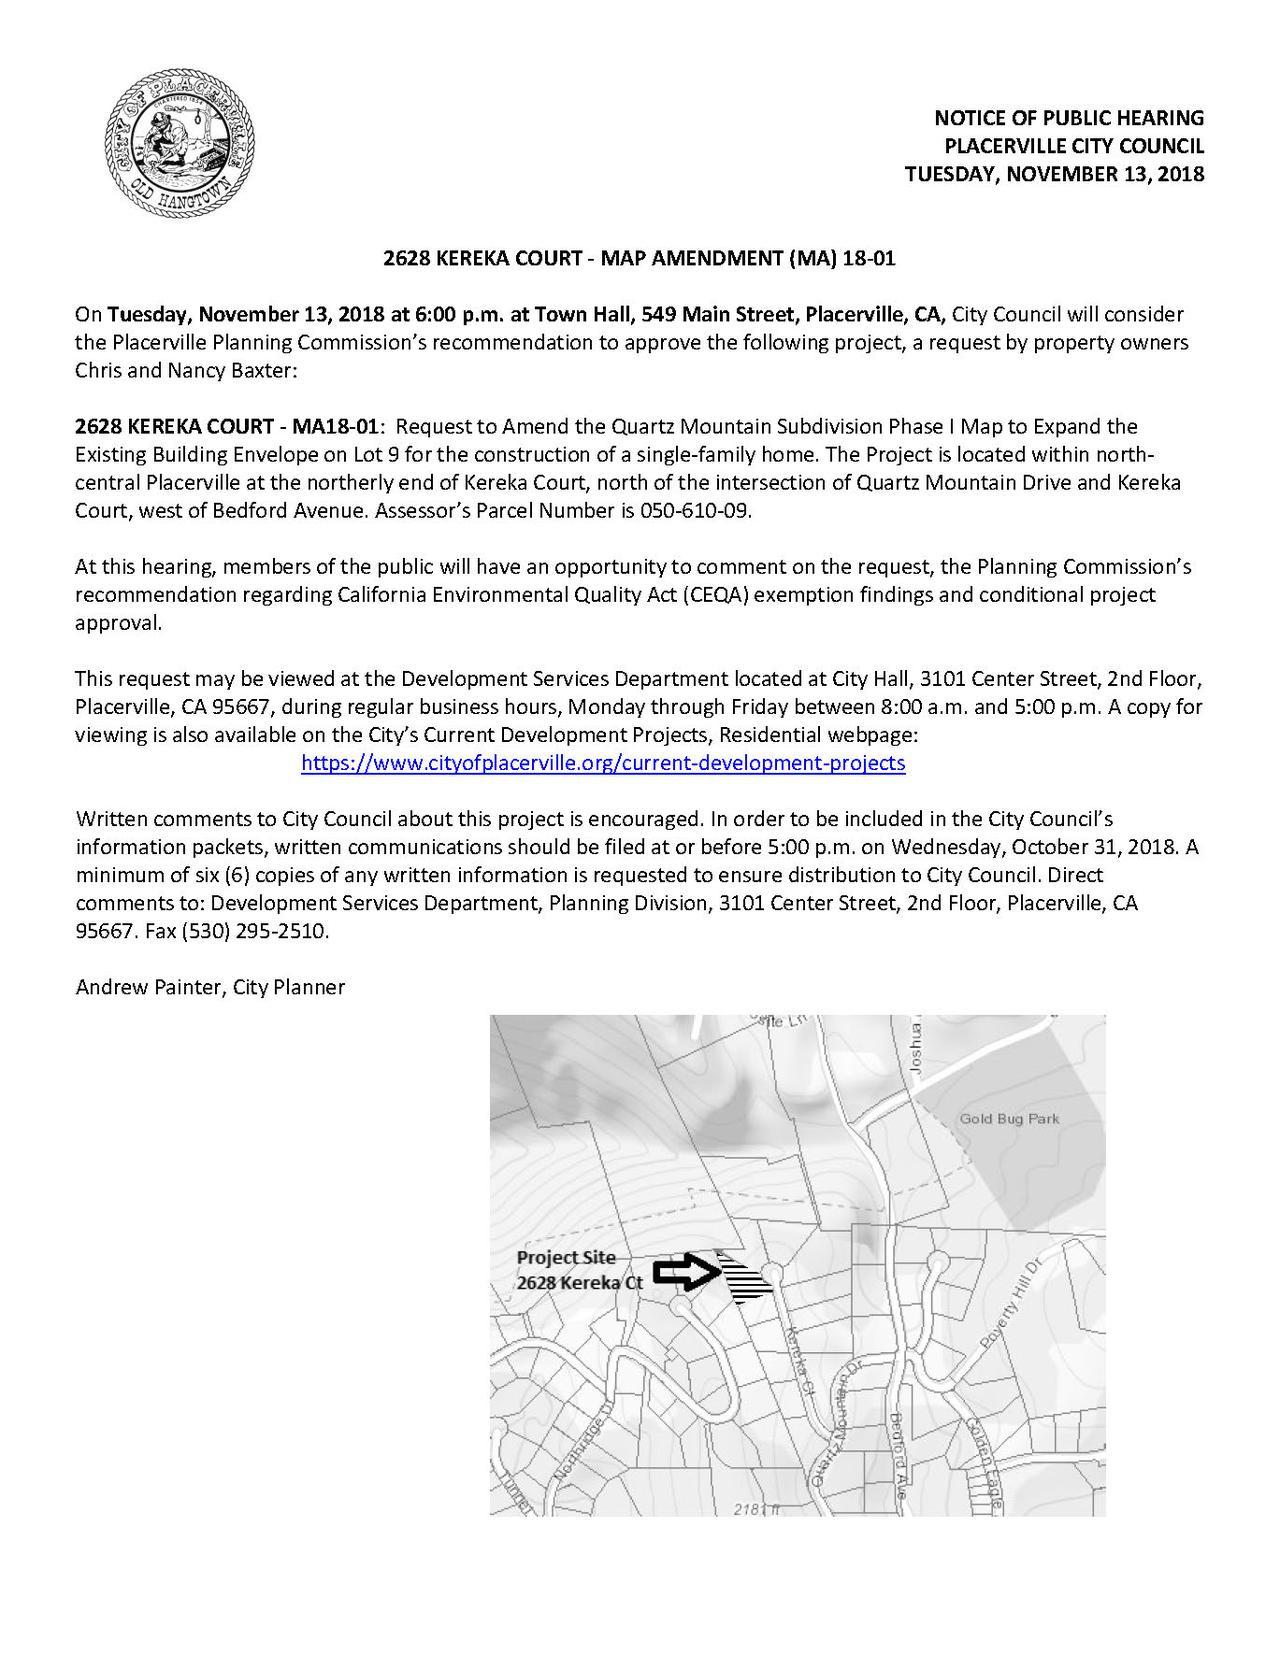 Placerville California Map.City Of Placerville California 2628 Kereka Court Map Amendment